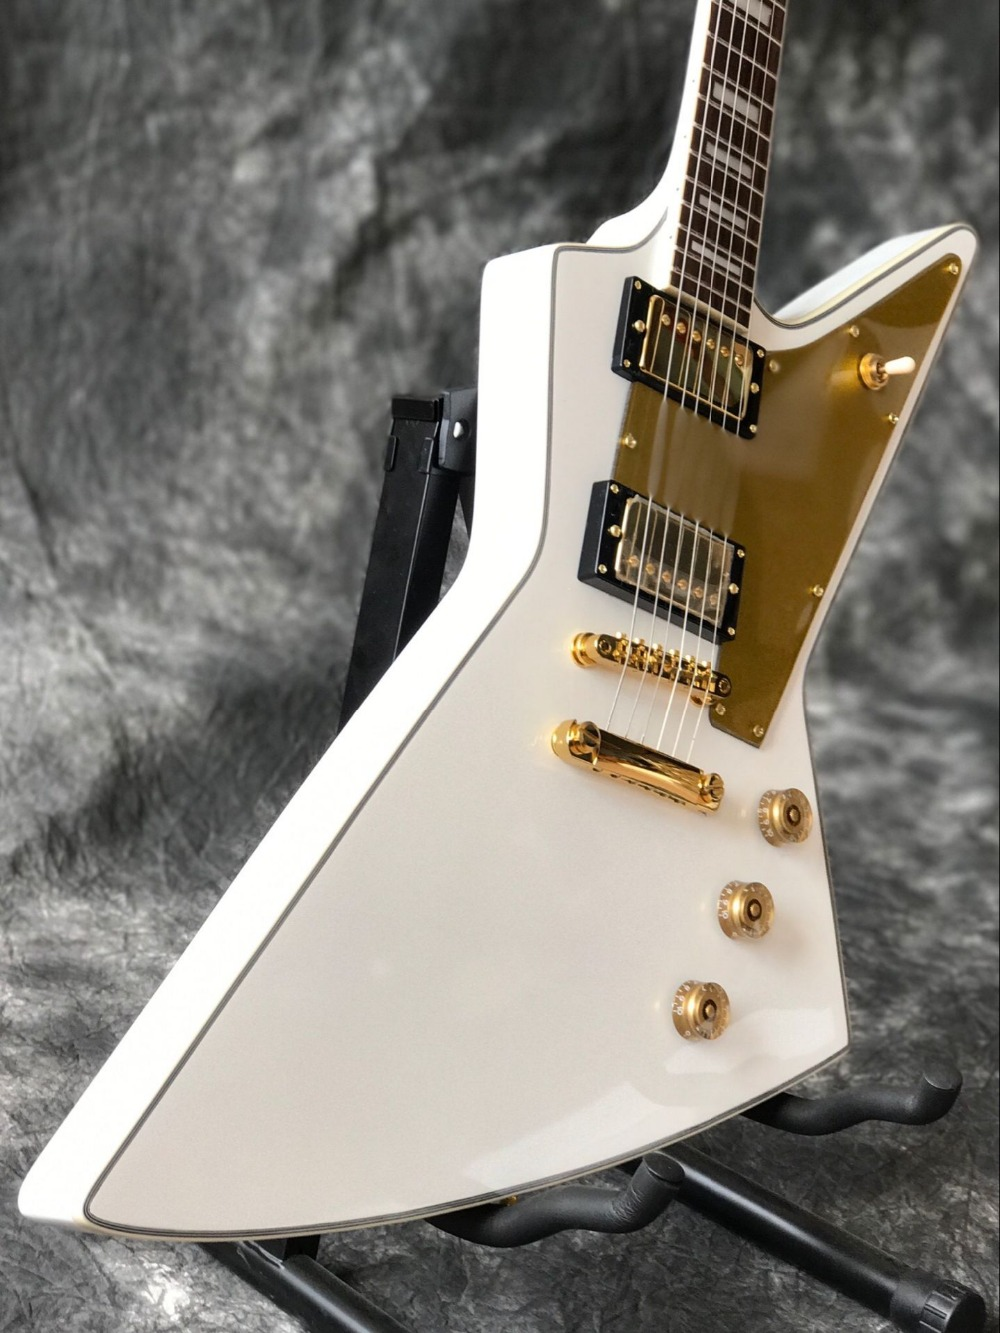 Factory shop gitaar, rosewood figerboard guitarra Custom Chibson 2 Open Humbucke Explorer White Electric guitar